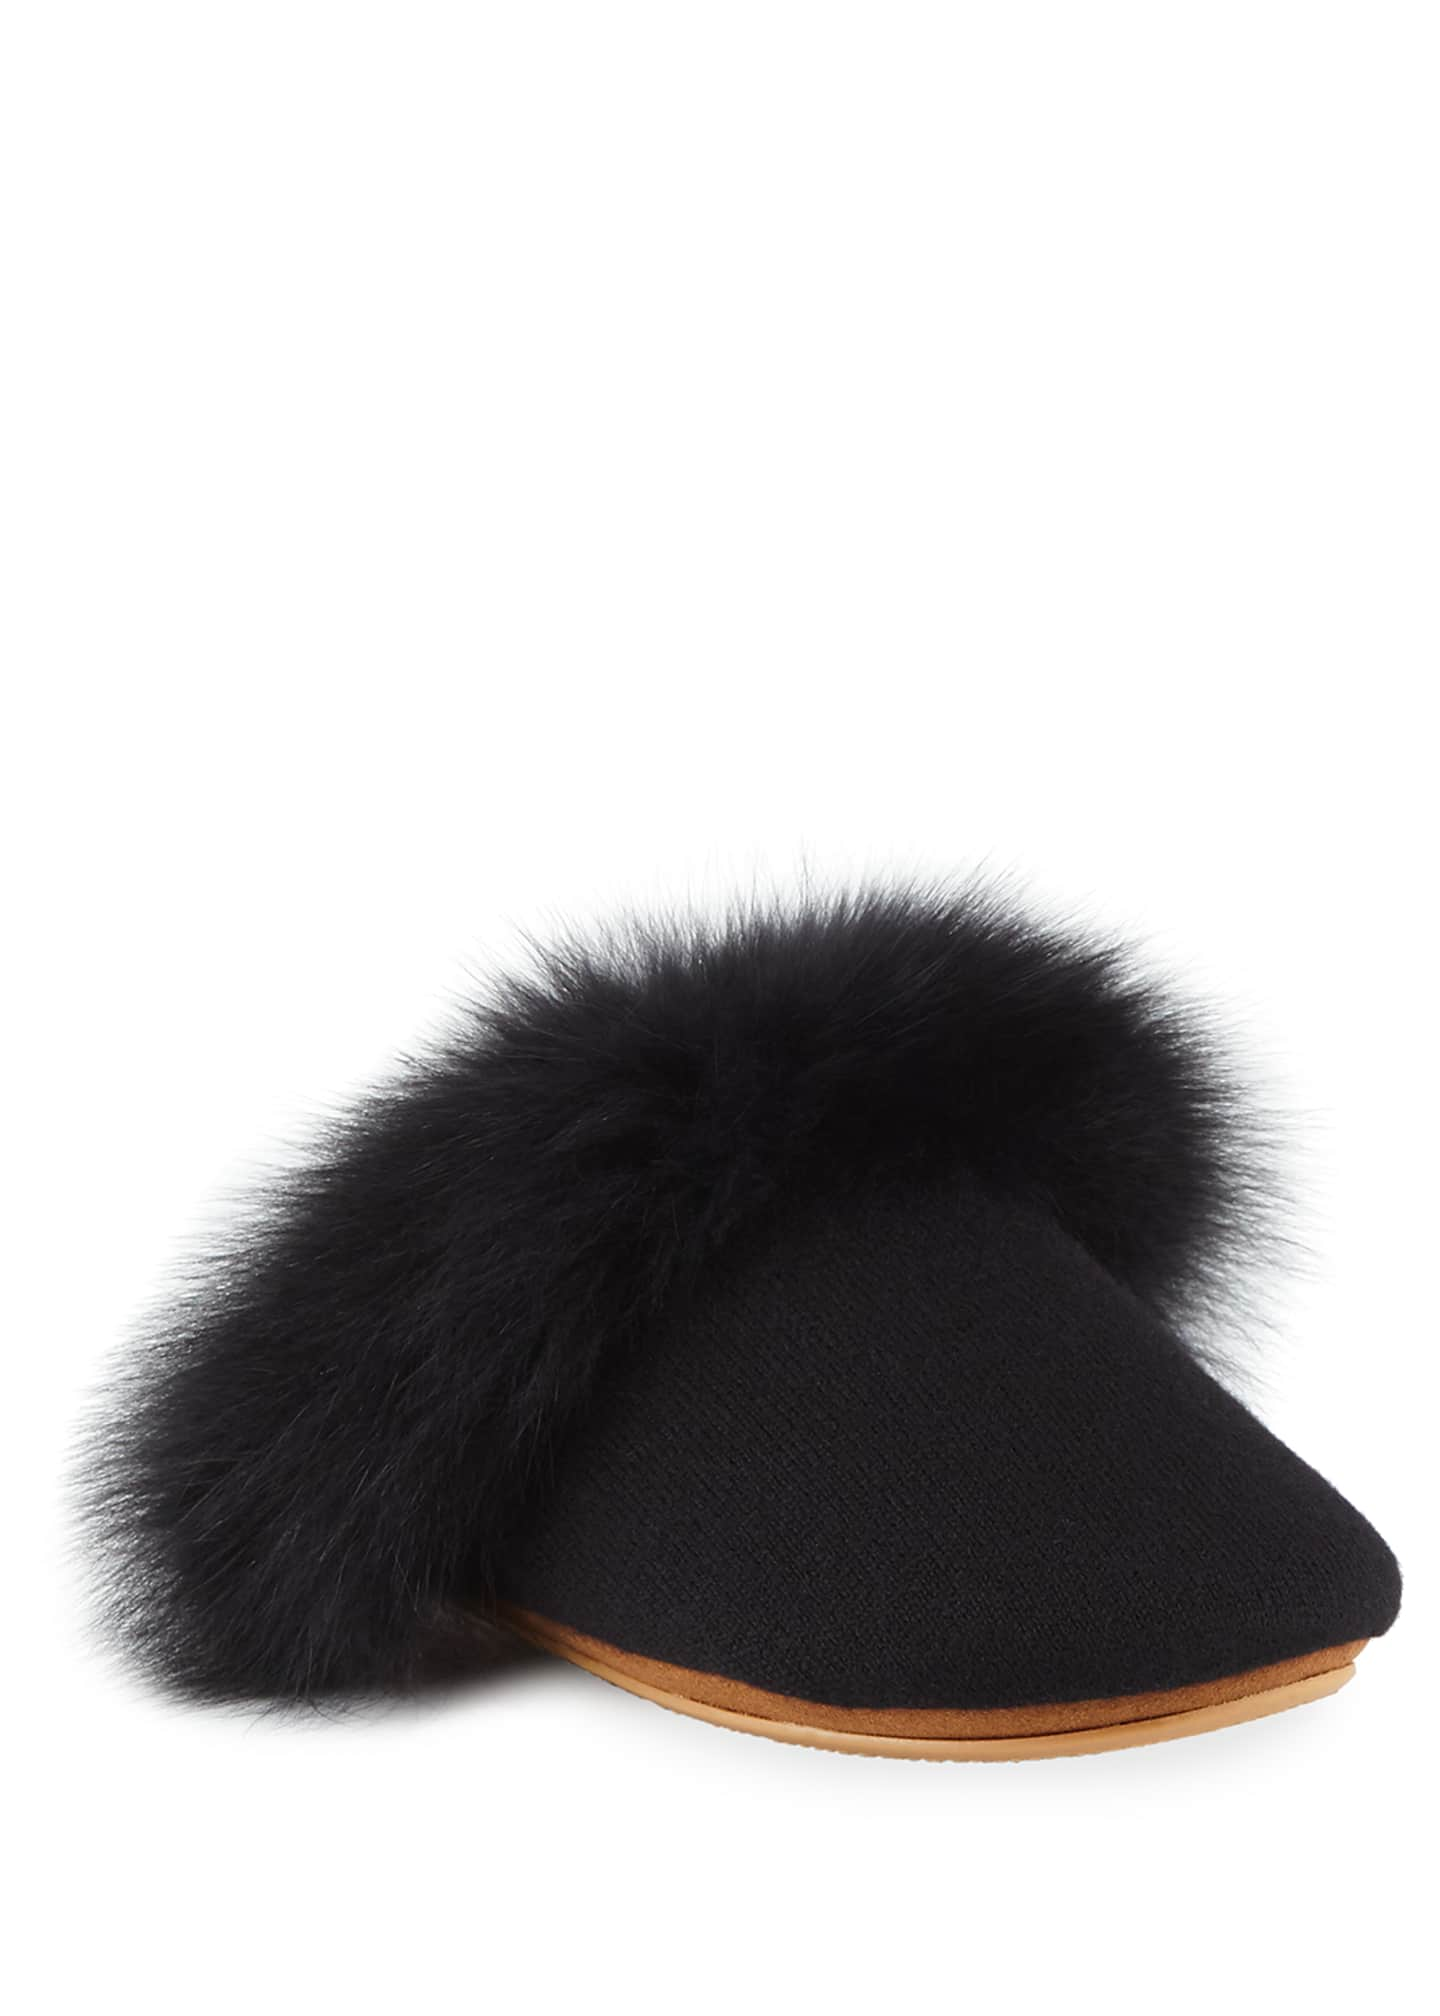 Neiman Marcus Cashmere Collection Cashmere Fox Fur-Trim Slippers